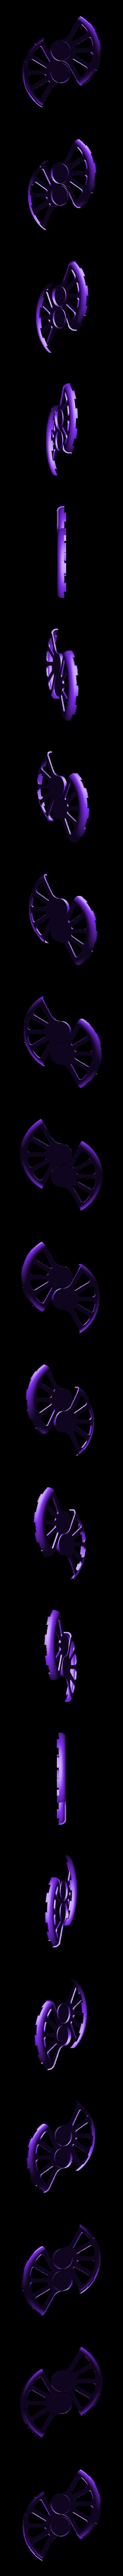 spinner_holder_third_lighten.stl Download free STL file Spinner Holder • 3D printable template, CyberCyclist